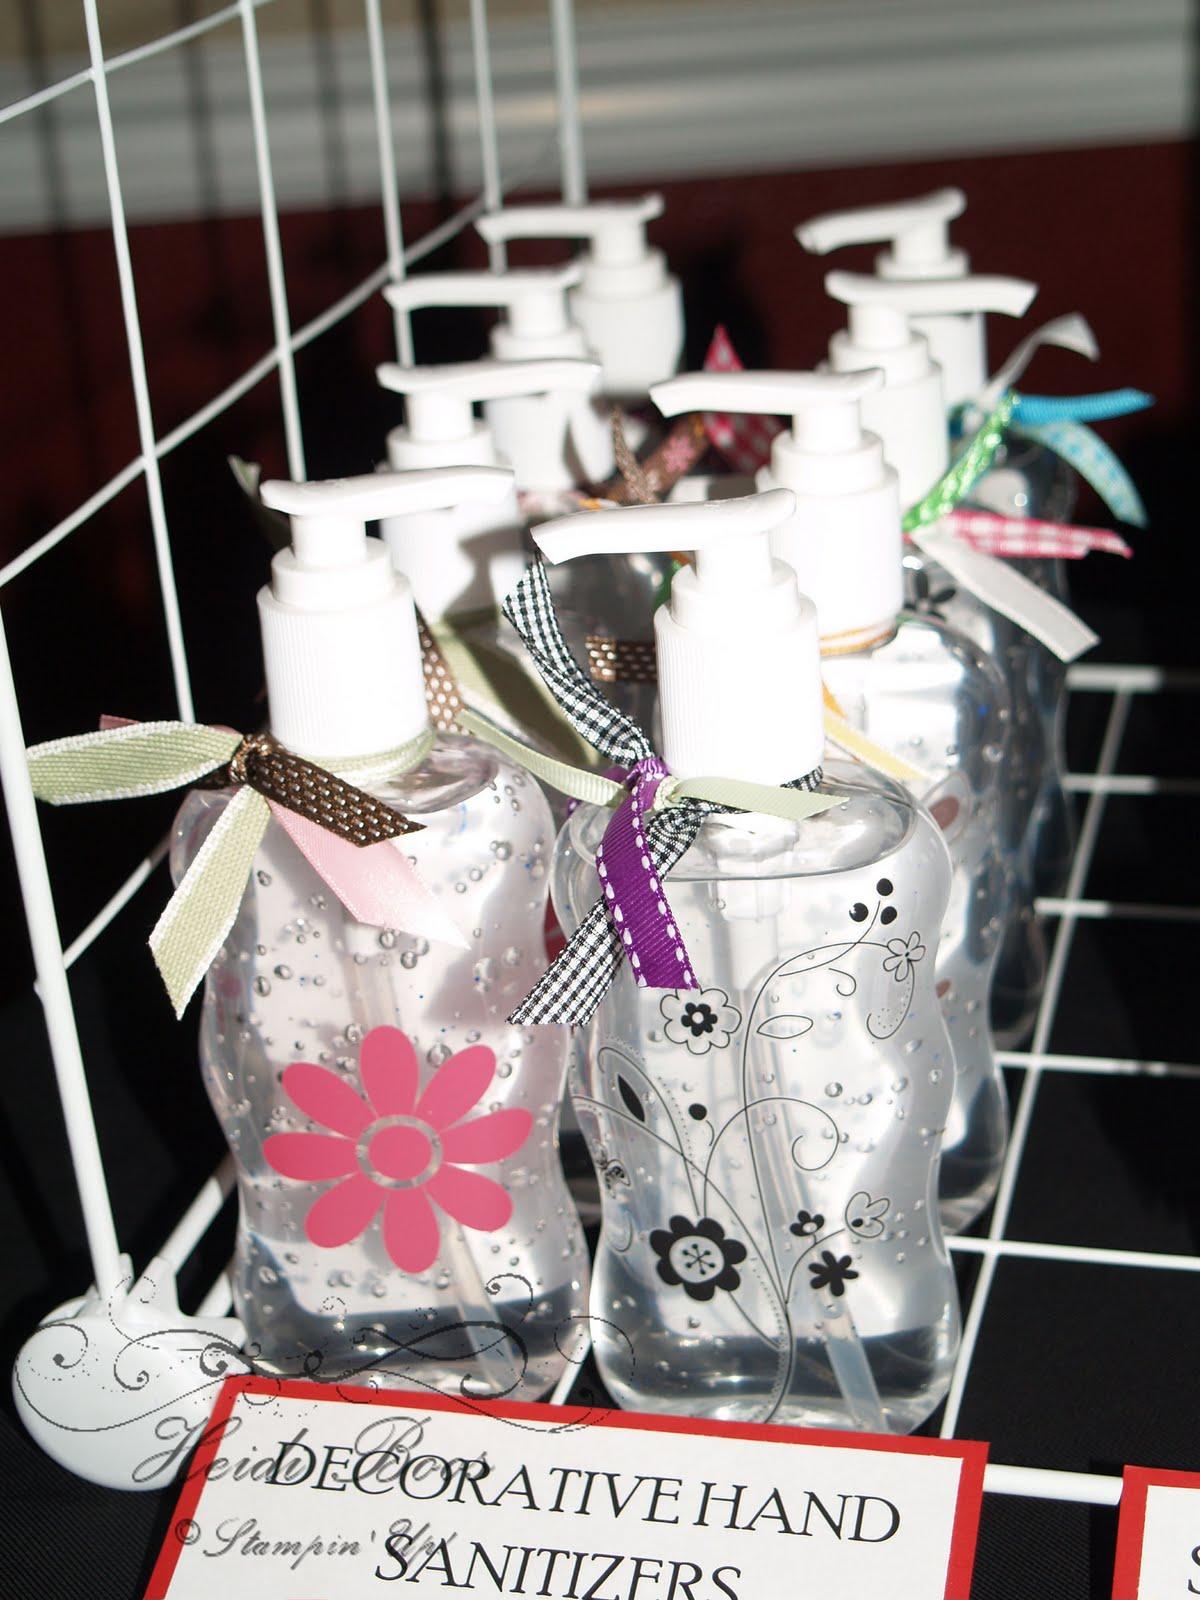 Christmas Craft Bazaar Ideas Part - 41: Christmas Crafts To Make For Church Bazaar : Blue Eyed Blessings Craft  Bazaar Fun